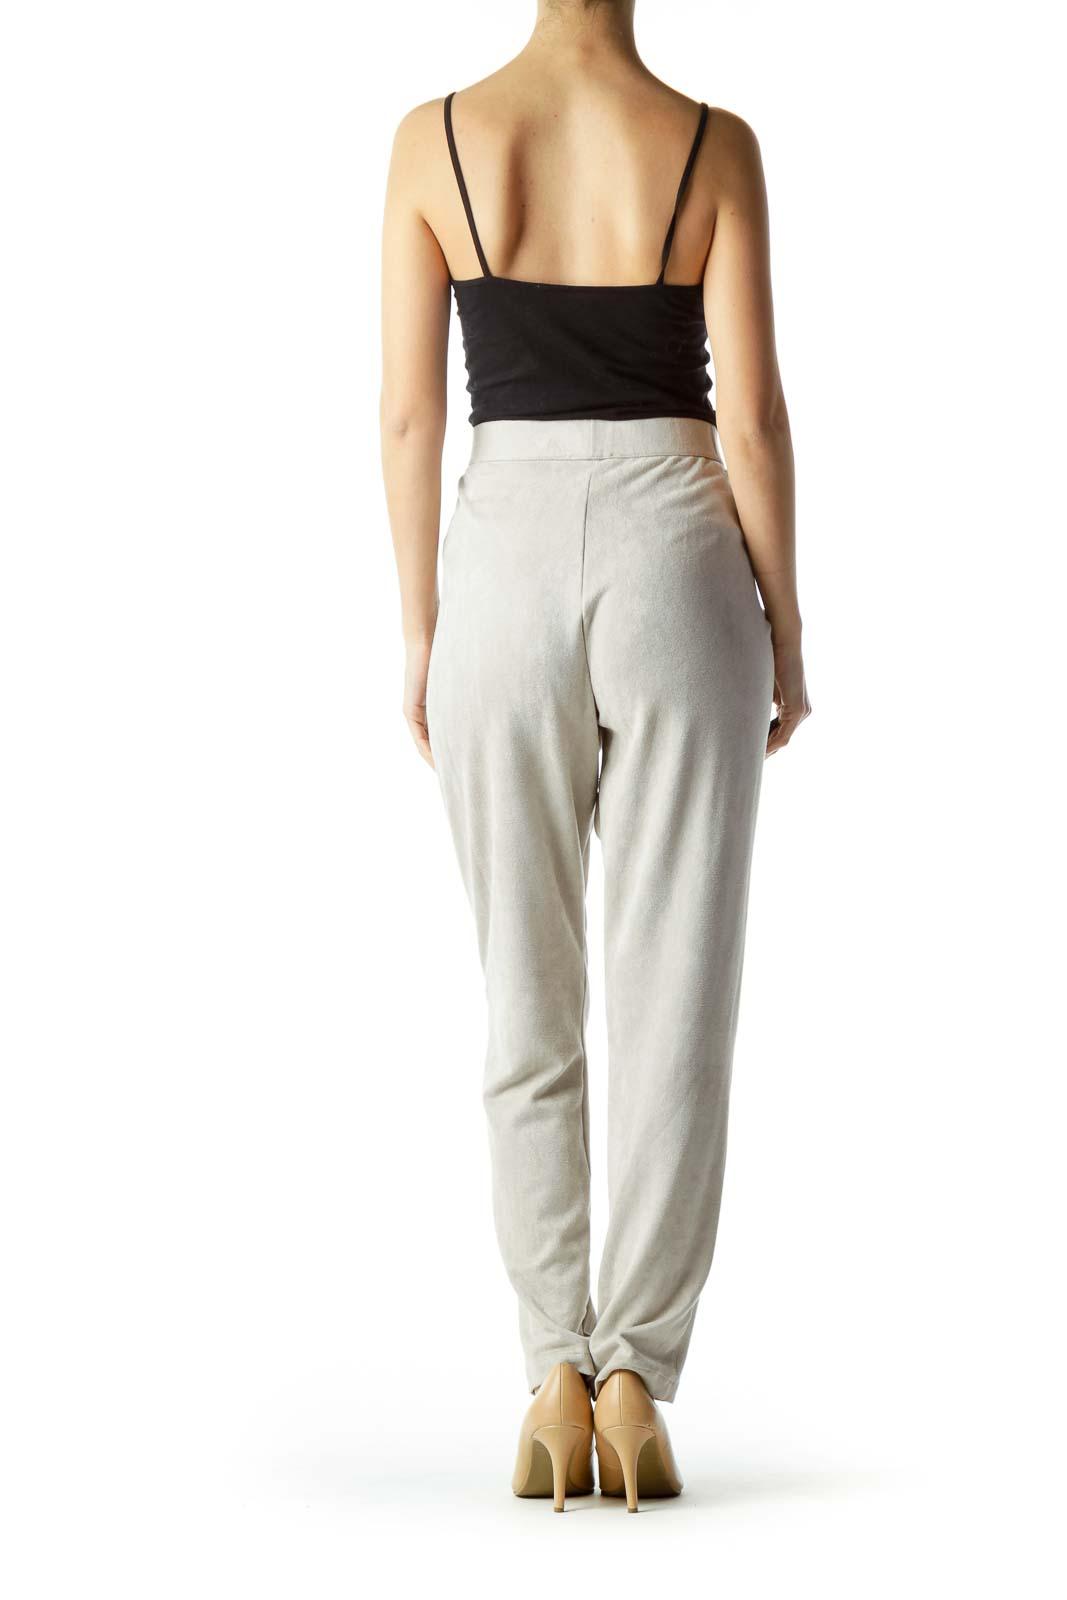 Shop Gray Faux Suede Leggings clothing and handbags at SilkRoll ... f1c88562b4912